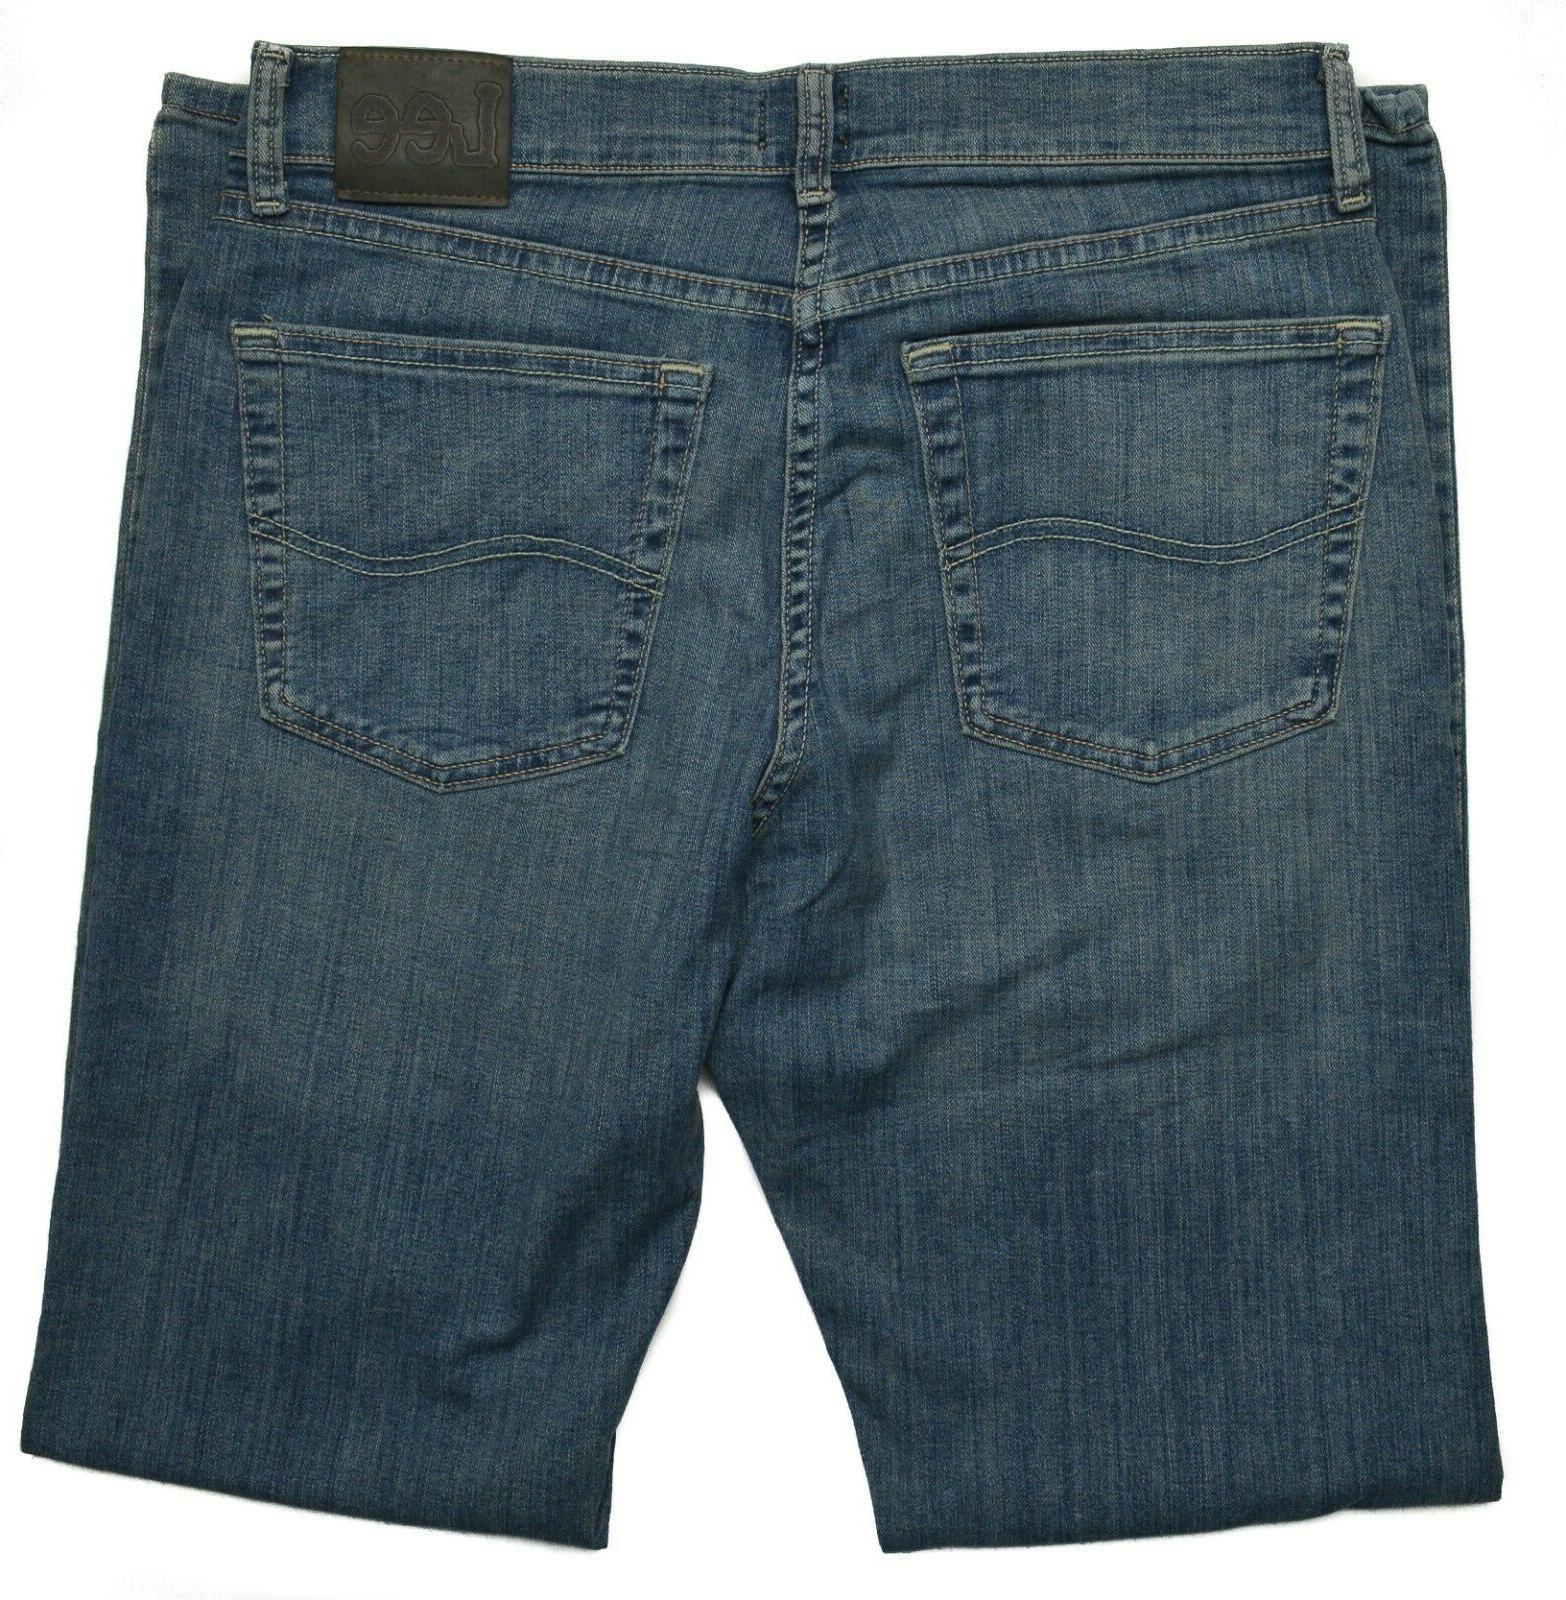 Lee Men's Classic Fit Leg Premium Jeans